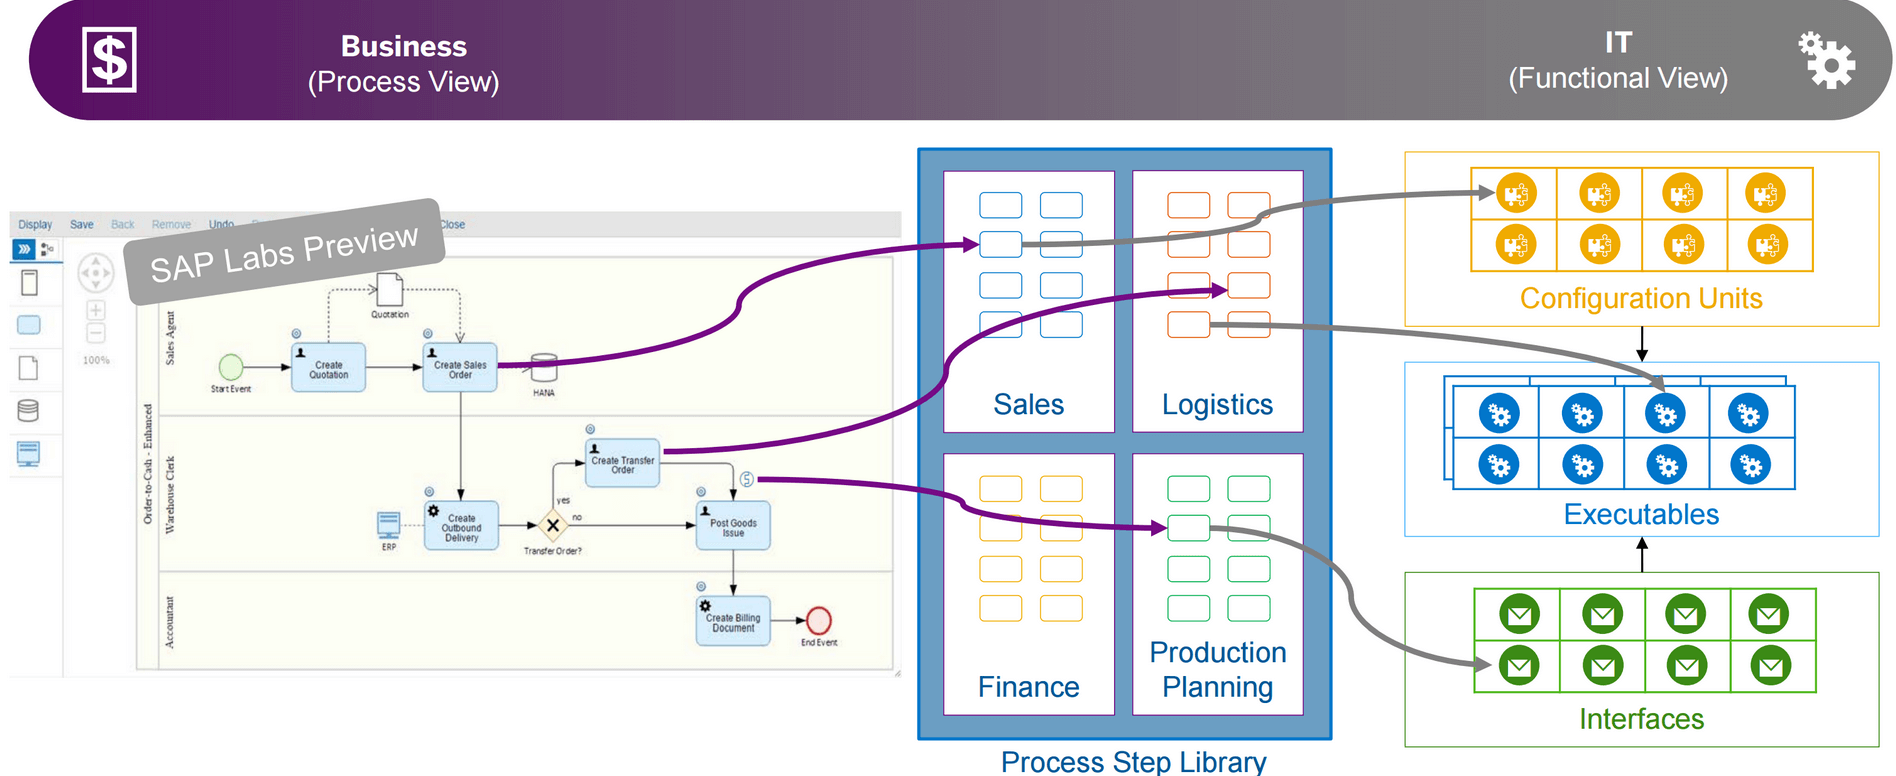 SAP Solution Manager, business process management